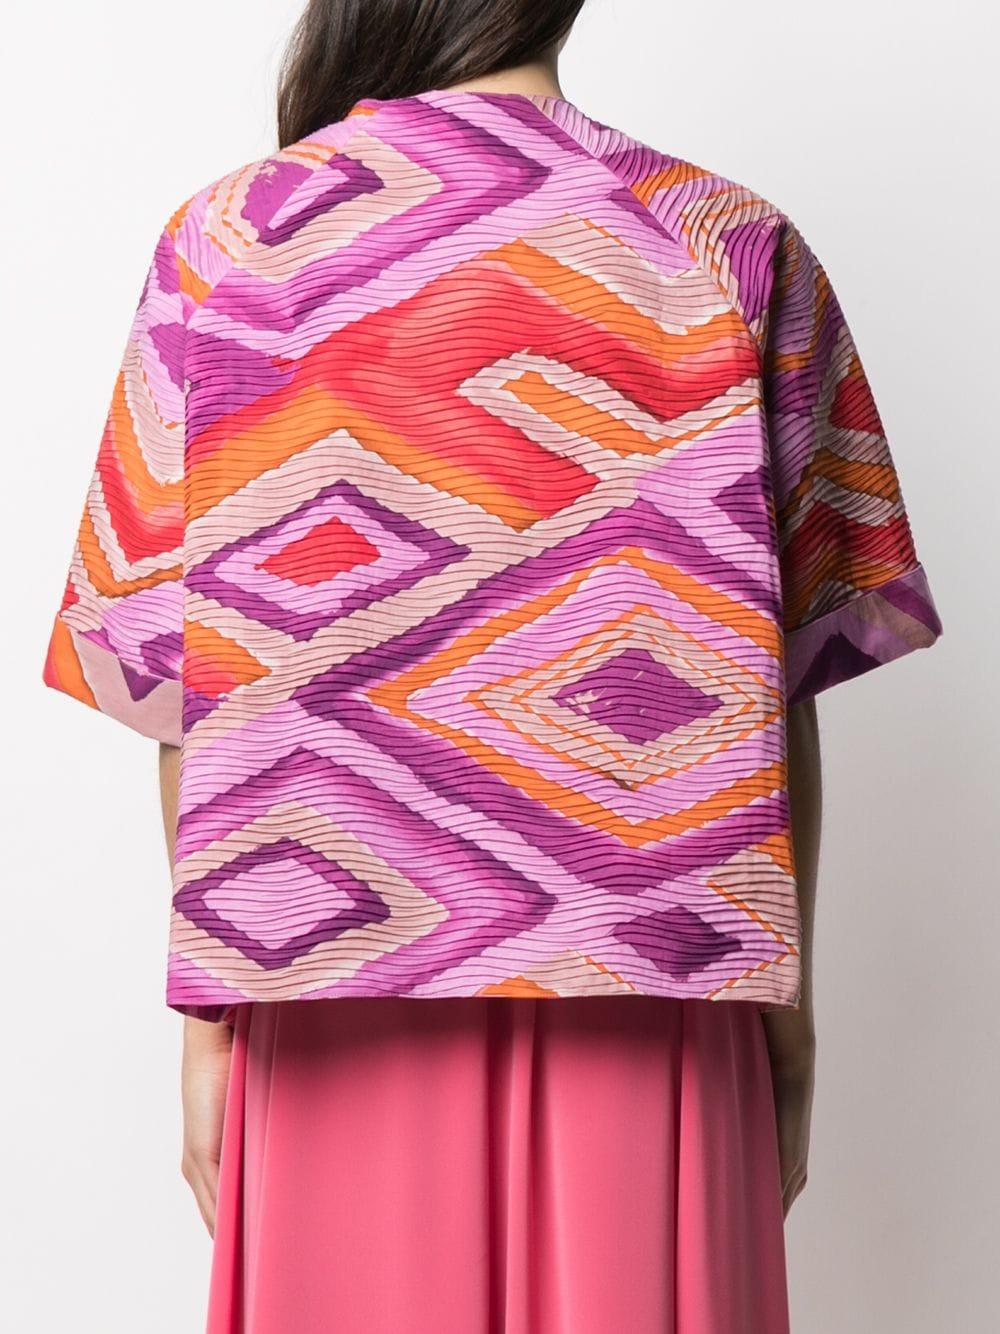 Giacca cropped in cotone rosa con stampa azteca GIANLUCA CAPANNOLO   Giacche   21EG210-100 MINA119761